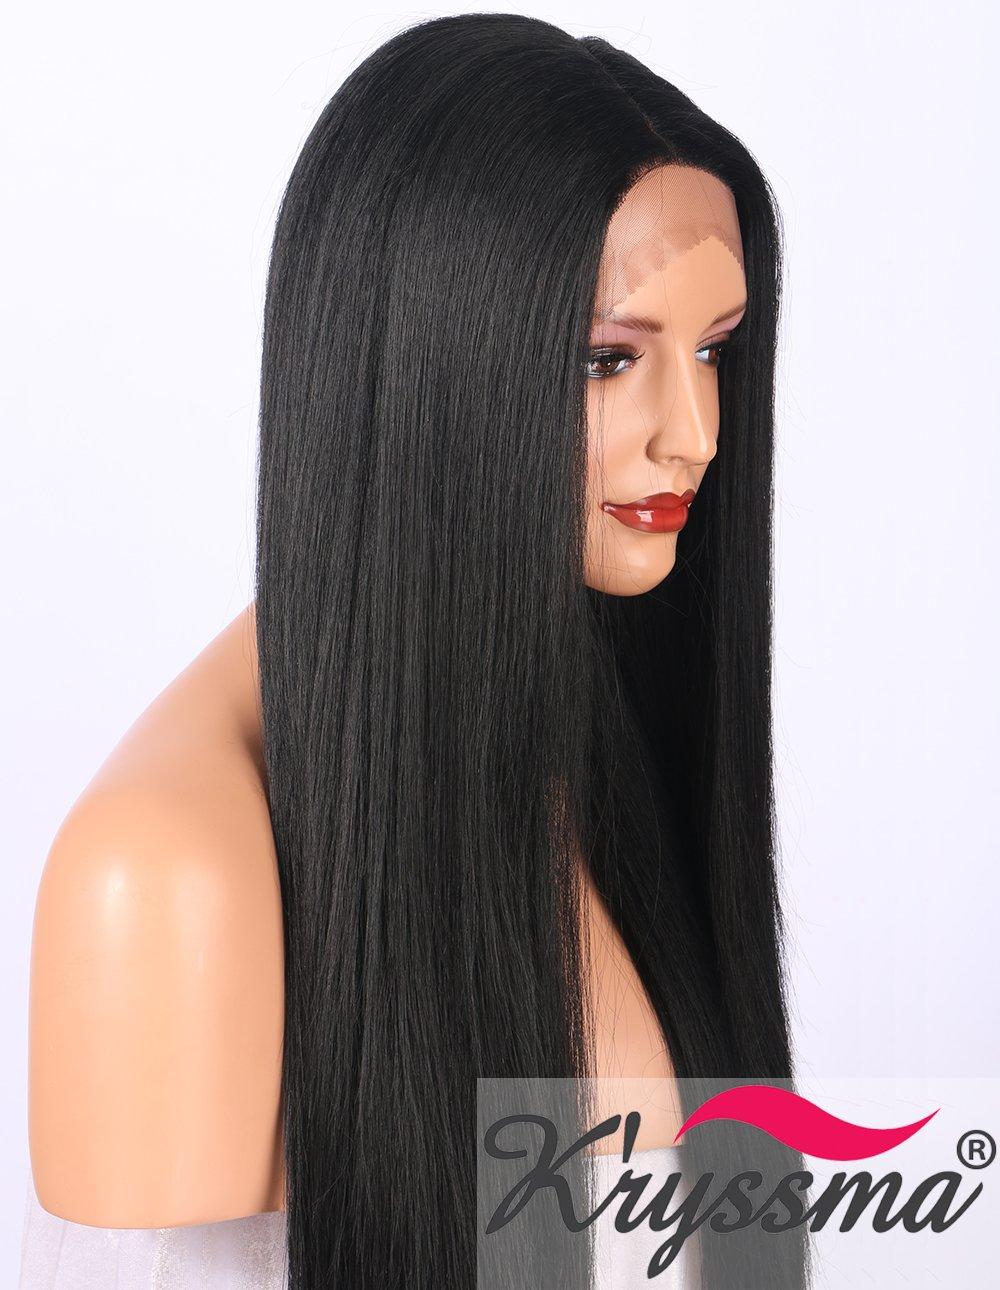 Peluca Kryssma Yaki frontal para mujer color negro de aspecto natural; peluca sintética separado profundo de cabello largo lacio atada a media mano, ...